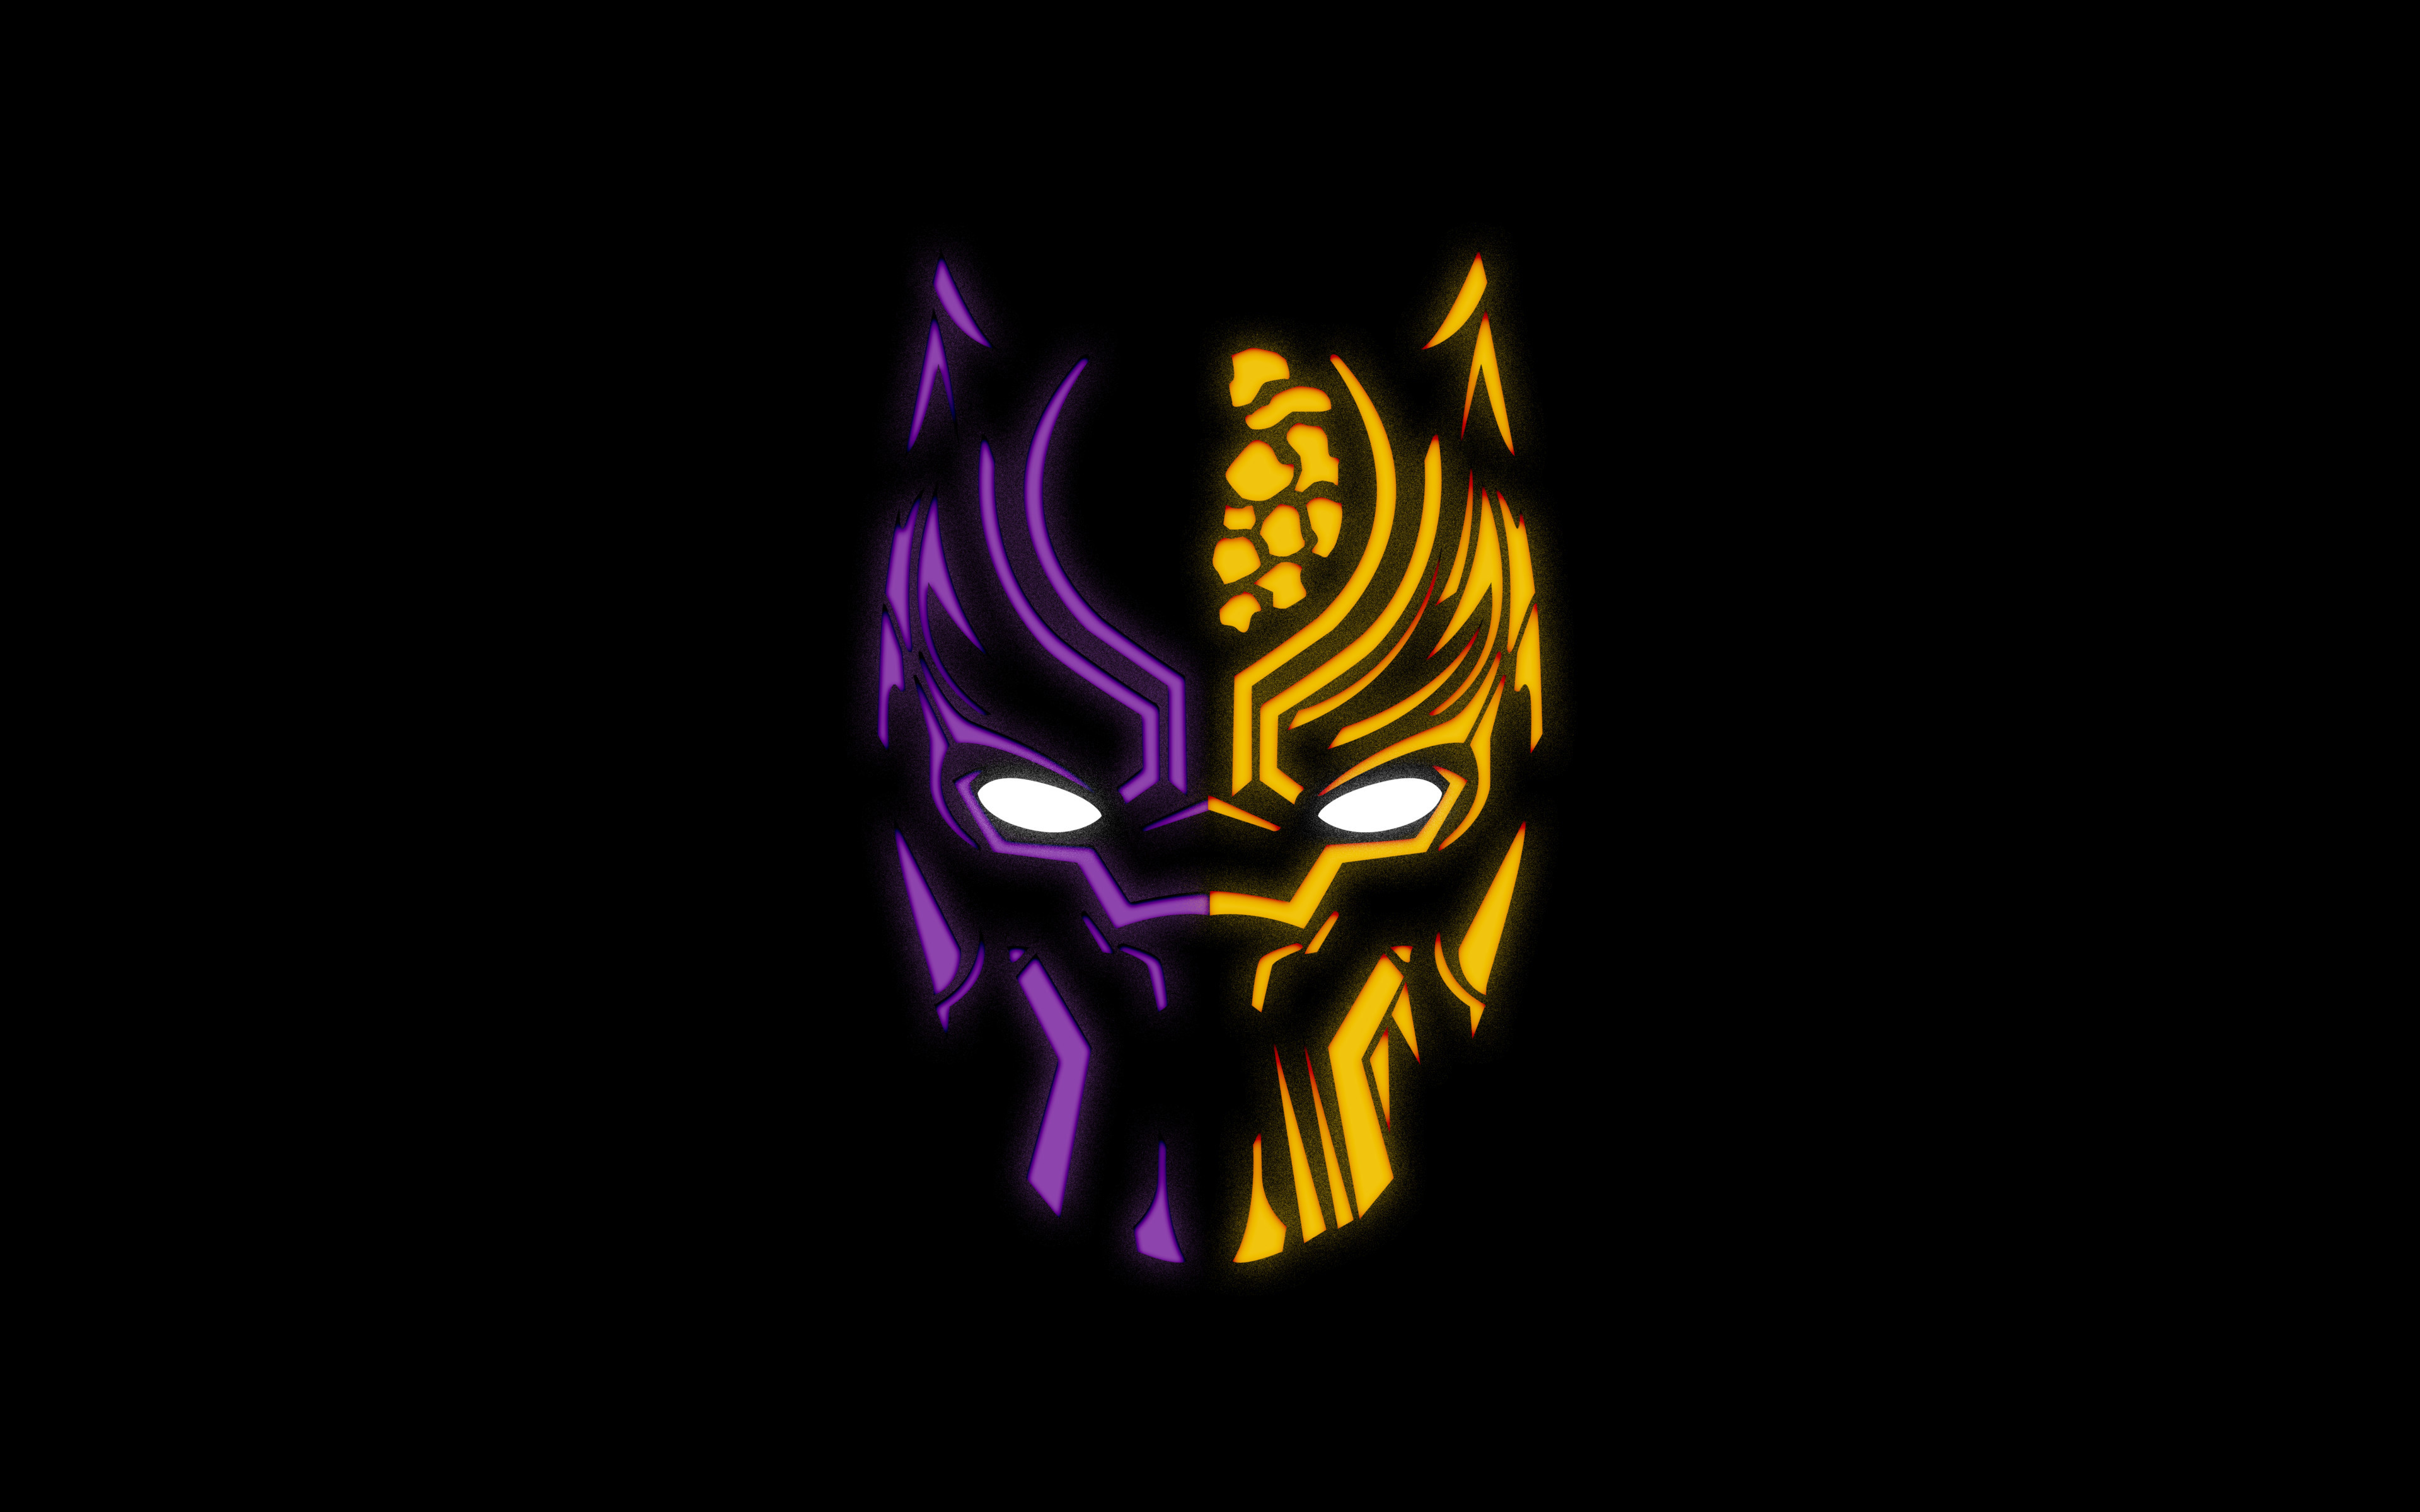 Black Panther Dual Screen Wallpapers - Top Free Black ...